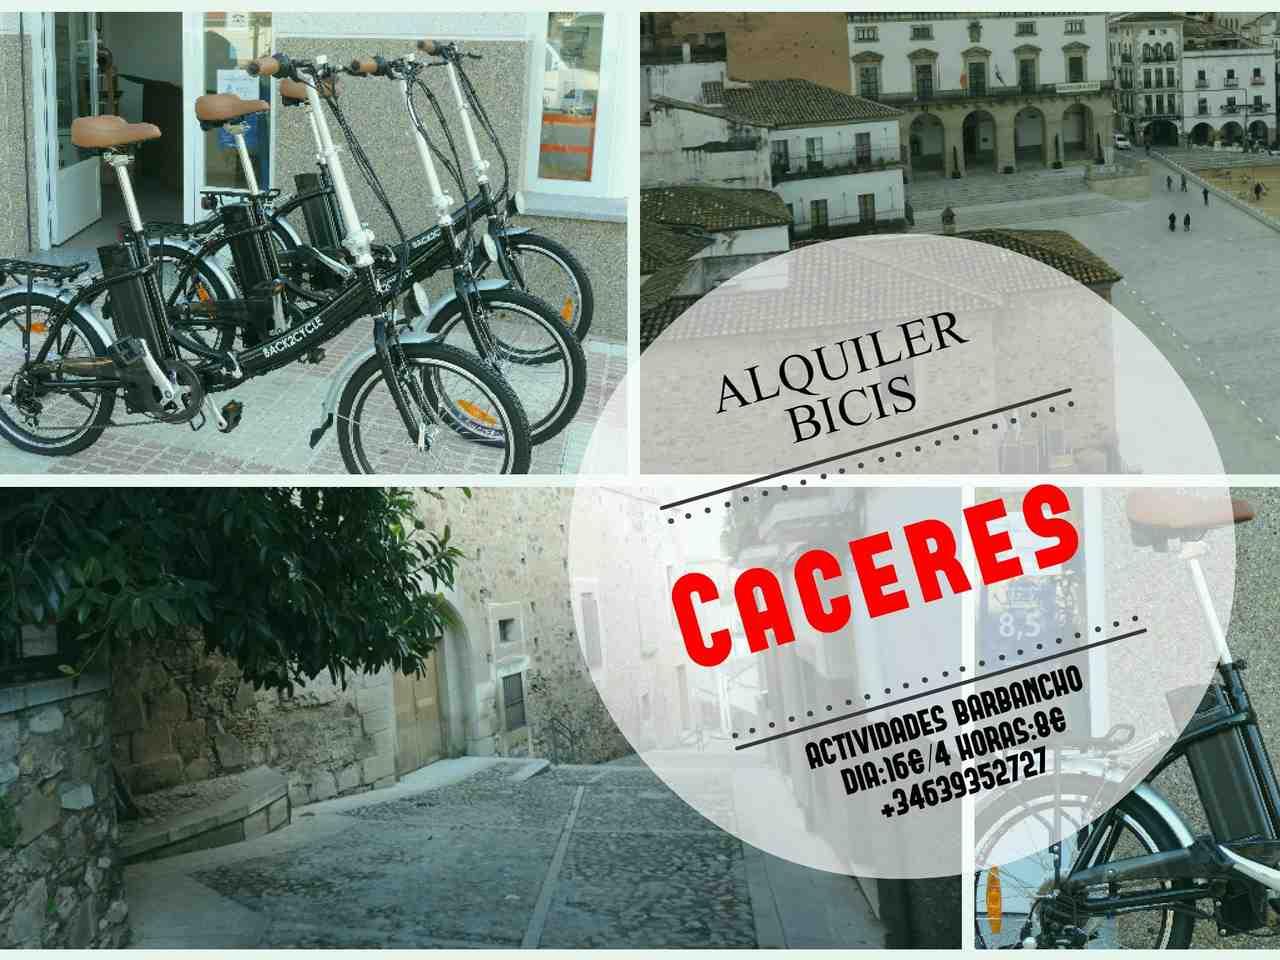 Pisos  alquiler Casar de Cáceres, Cáceres